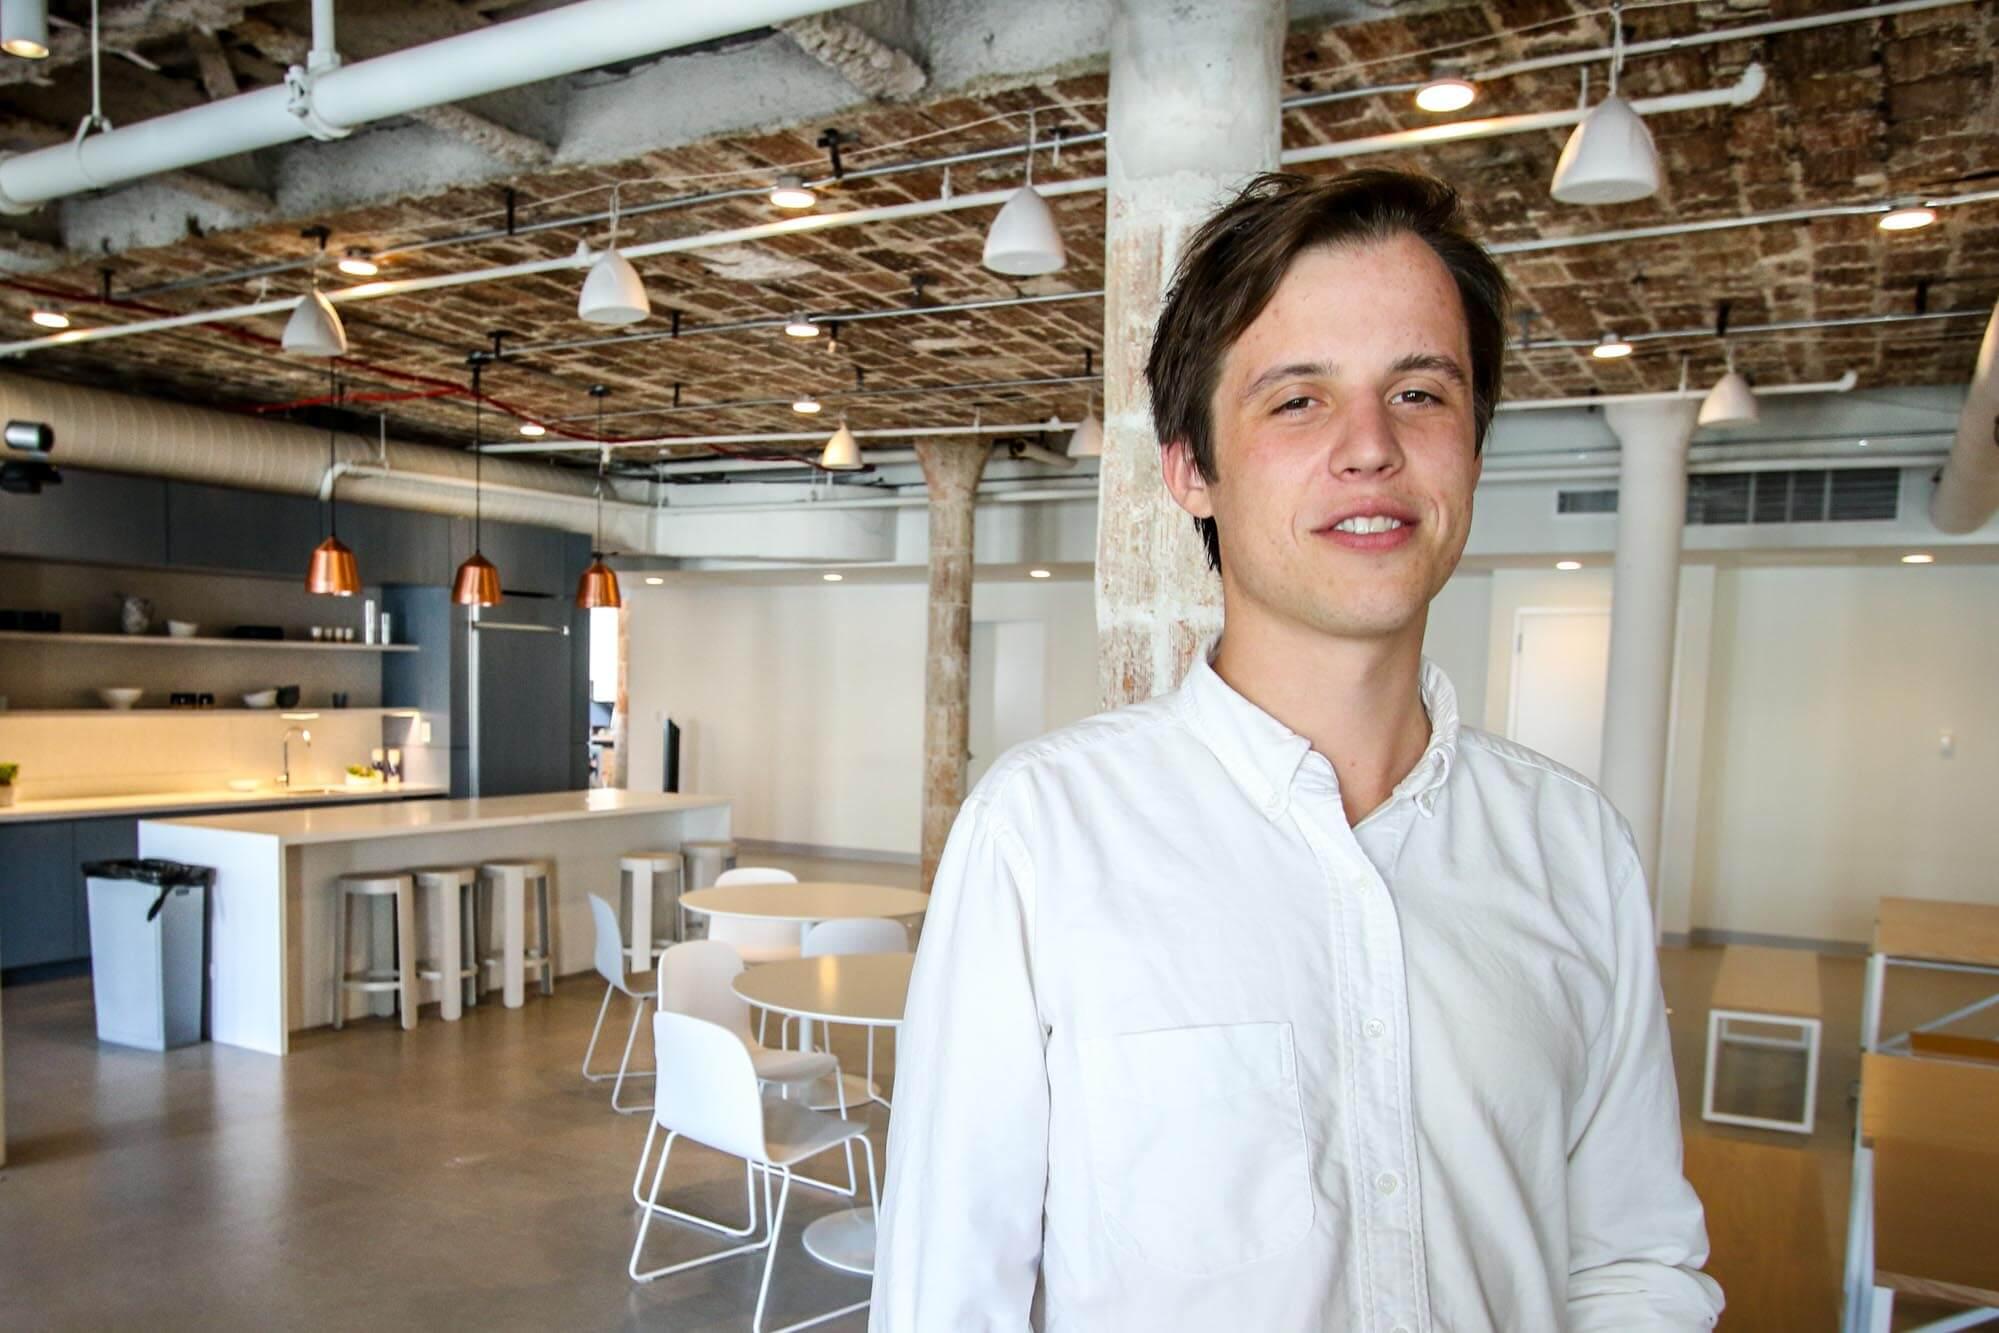 Building The Last Brand In Sleep Casper Cco Luke Sherwin